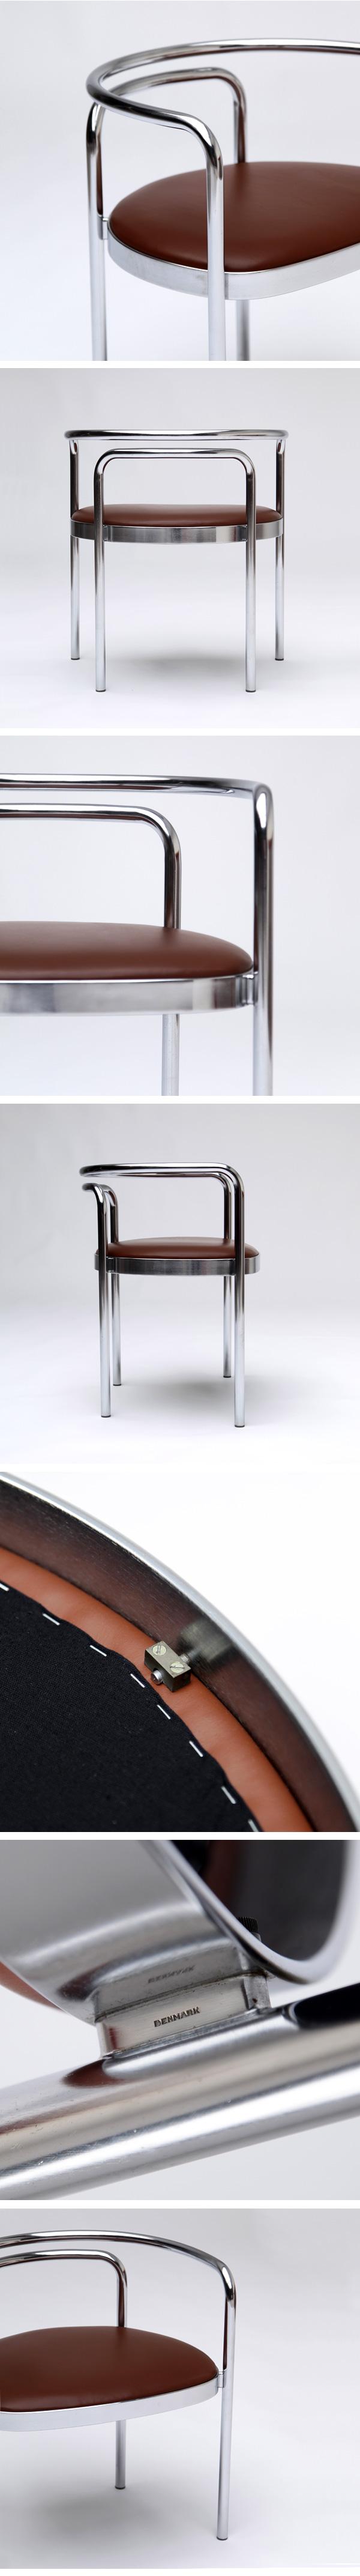 Poul Kjaerholm, PK 12, chair, steel tubing